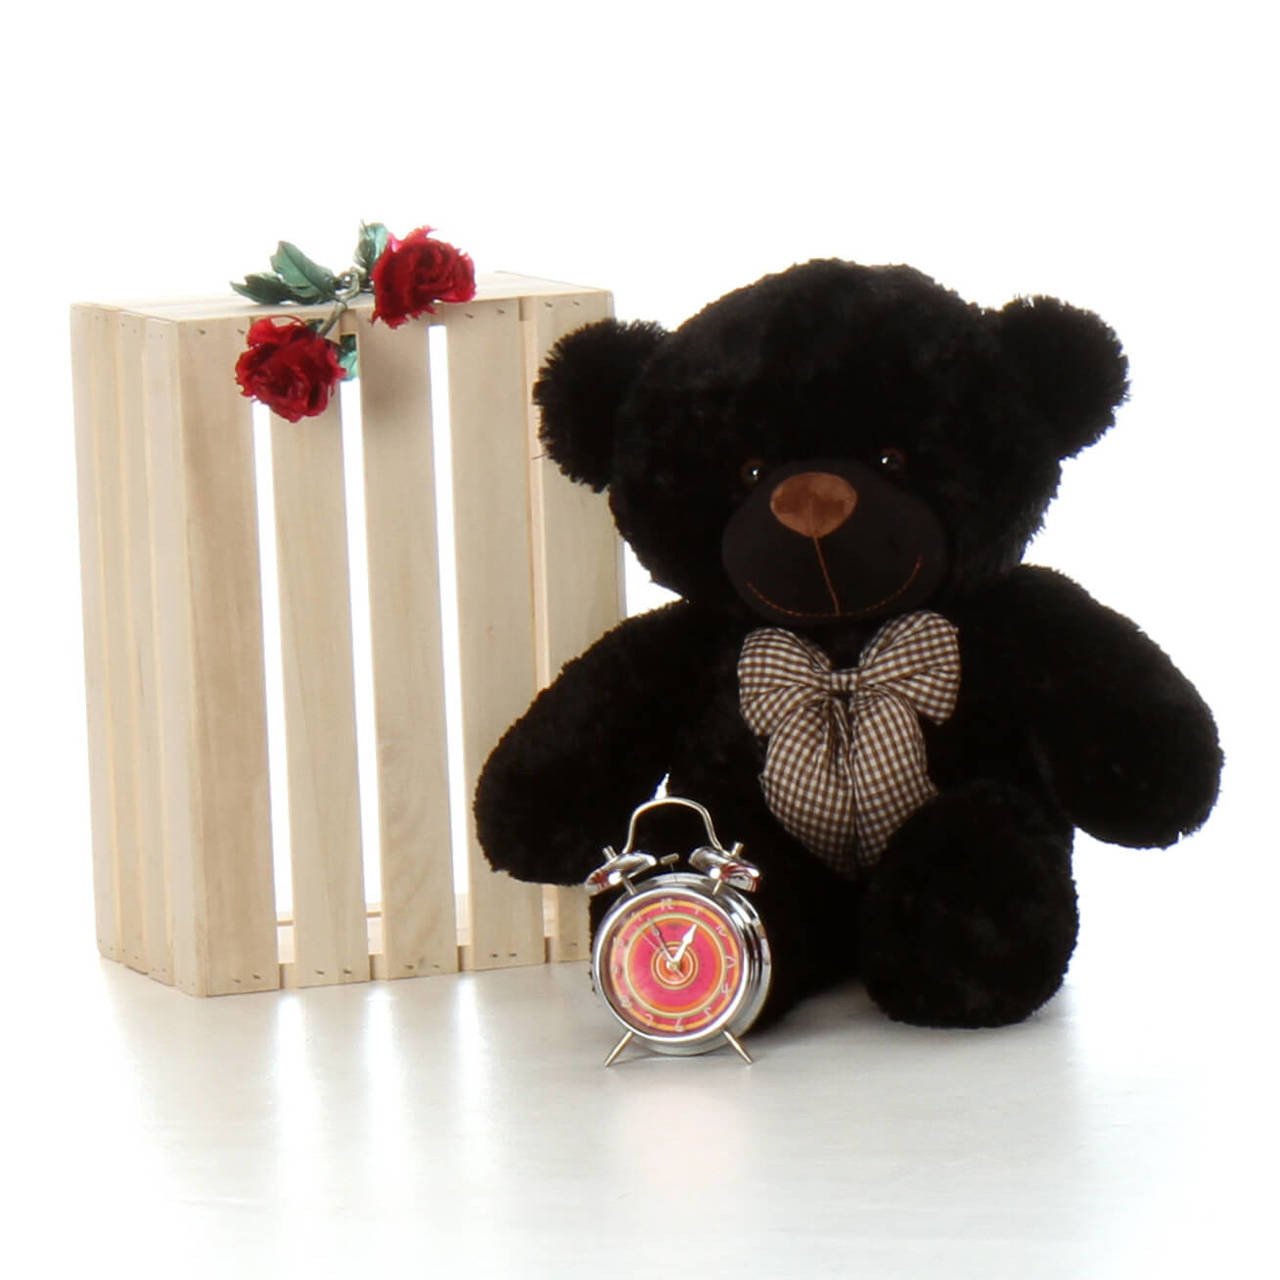 30in Oversized Teddy Bear Juju Cuddles soft and huggable black fur